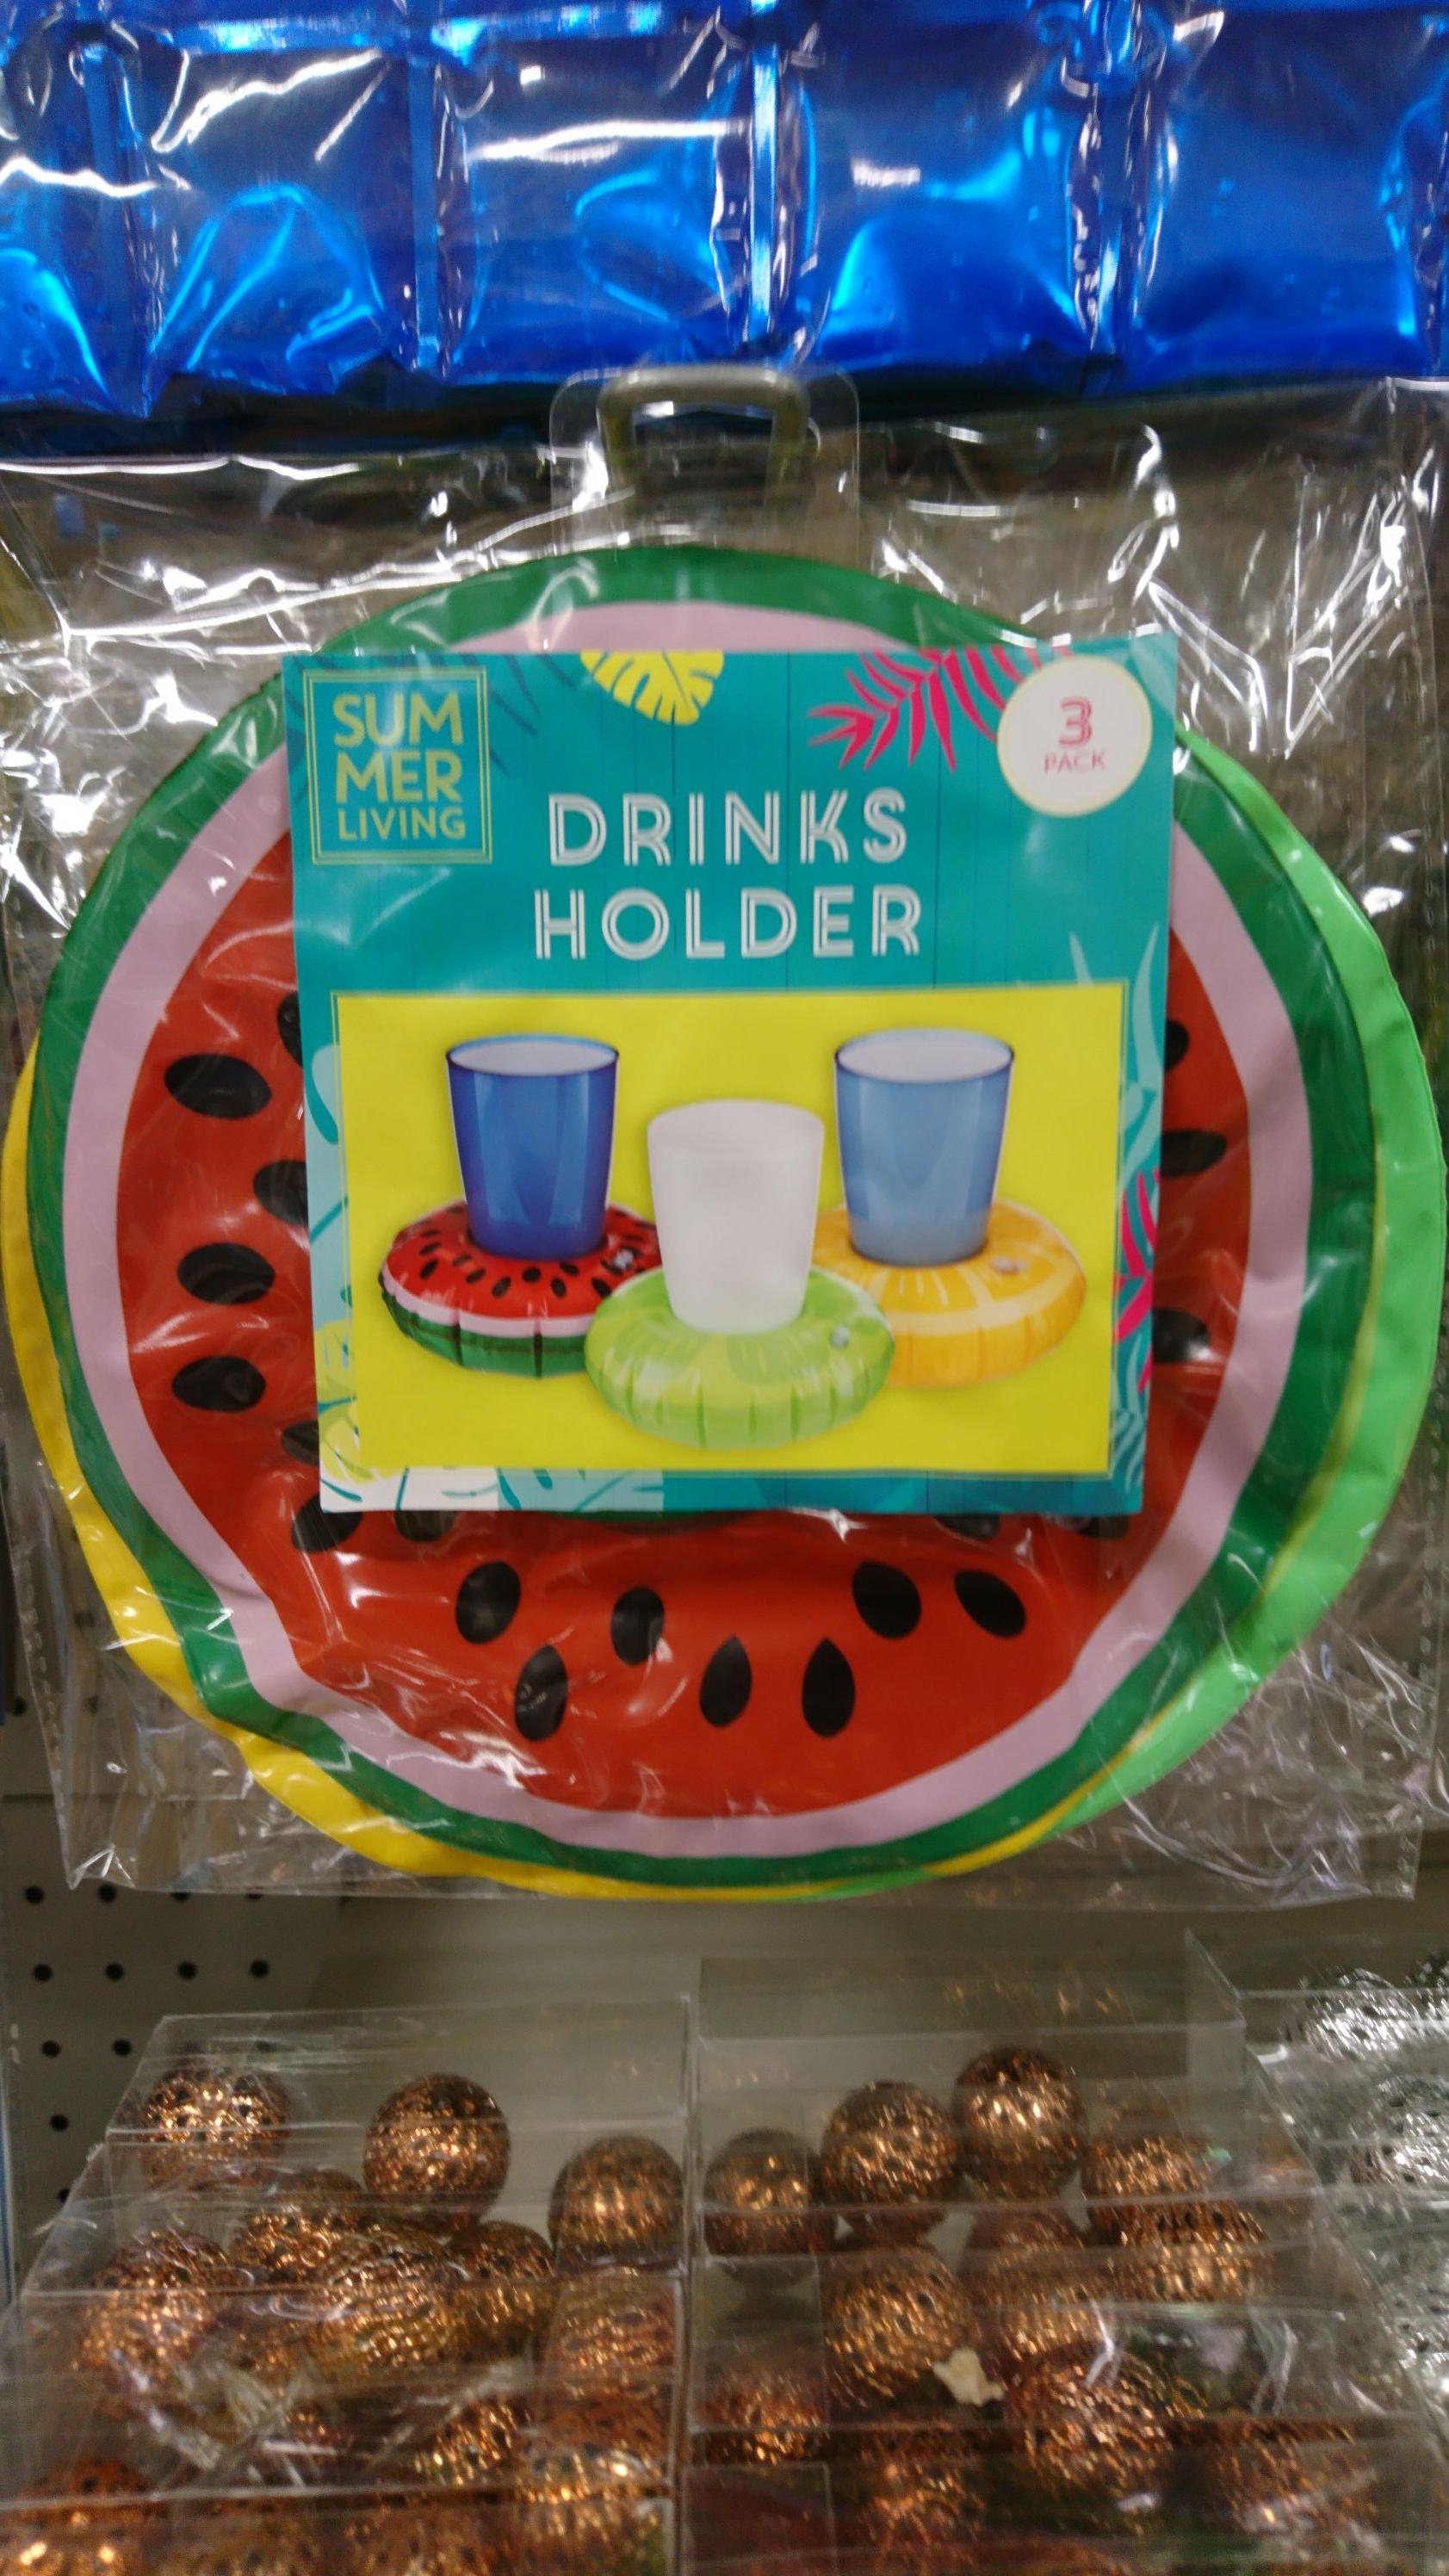 Floating drinks holder for the pool 3pack £1 @ poundland